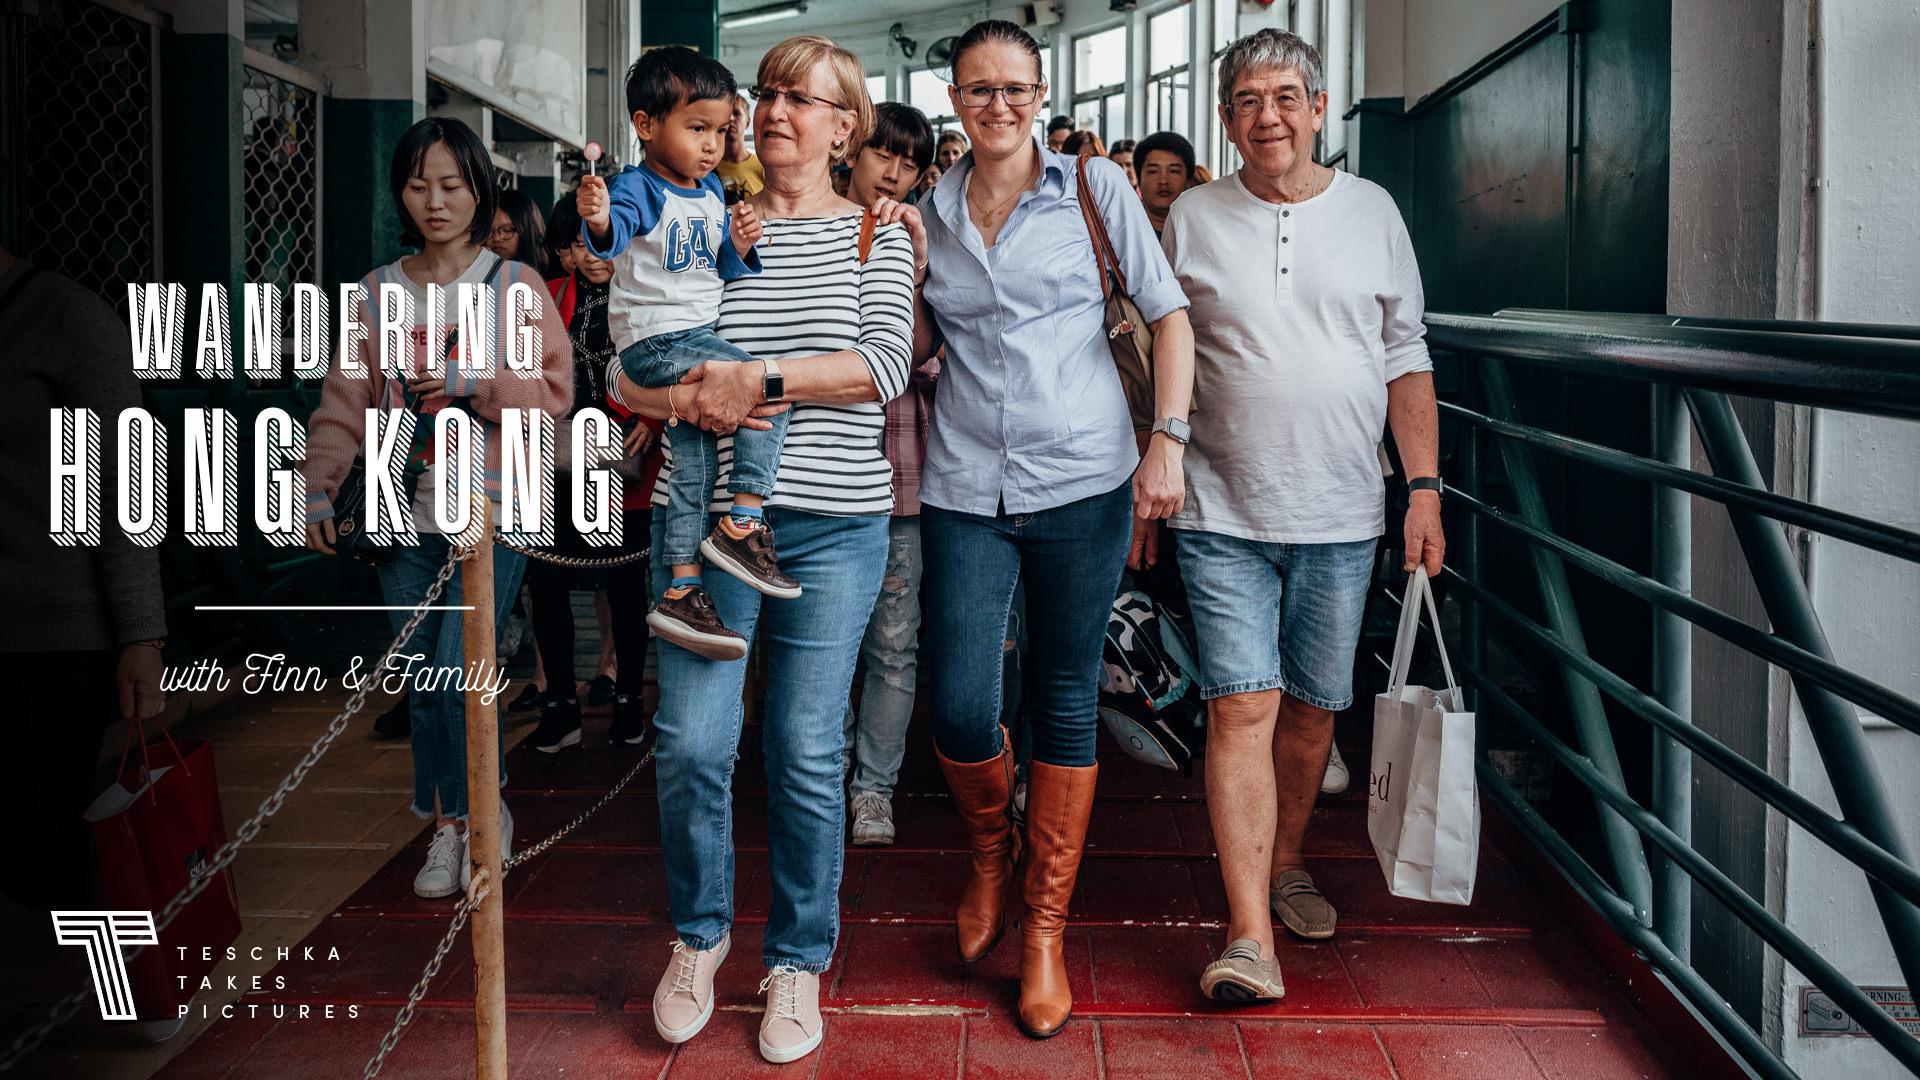 wandering hong kong - an urban shoot in central